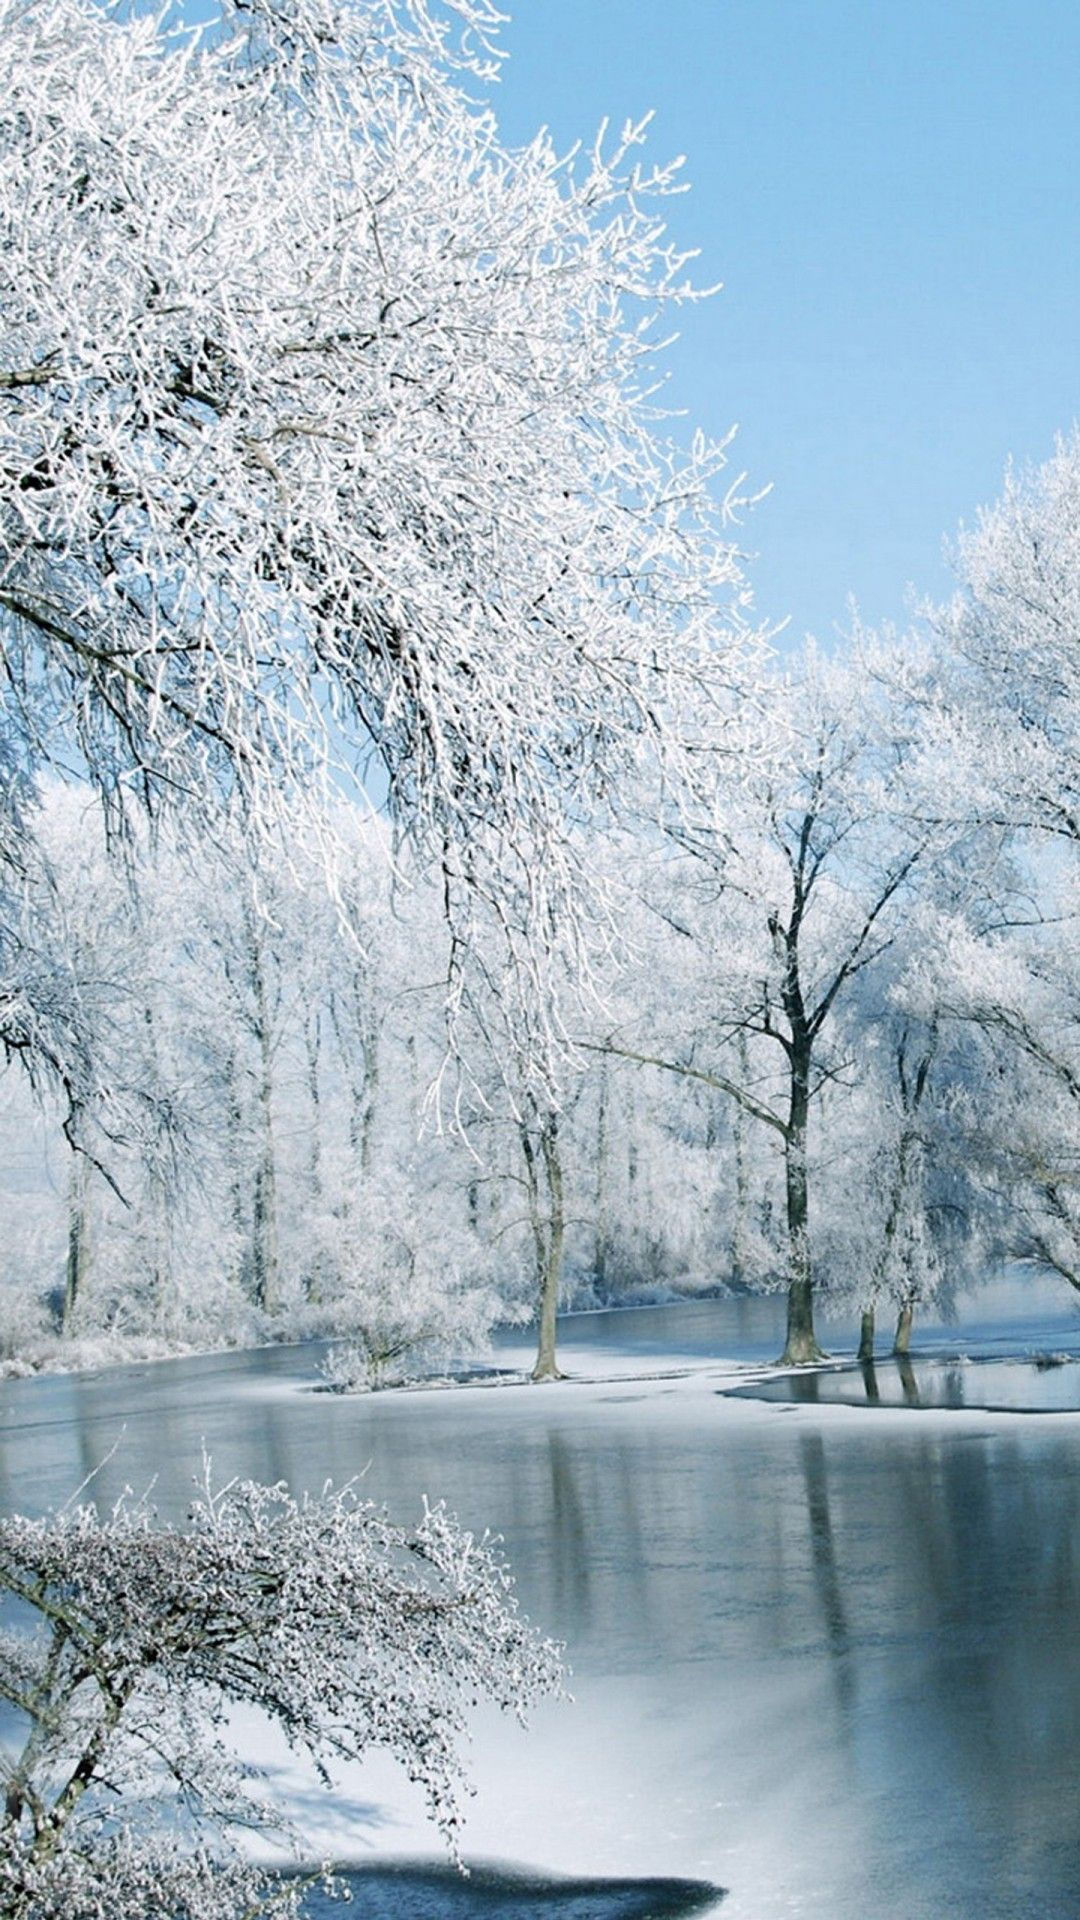 Winter Lake Wallpaper Hd pertaining to winter hd